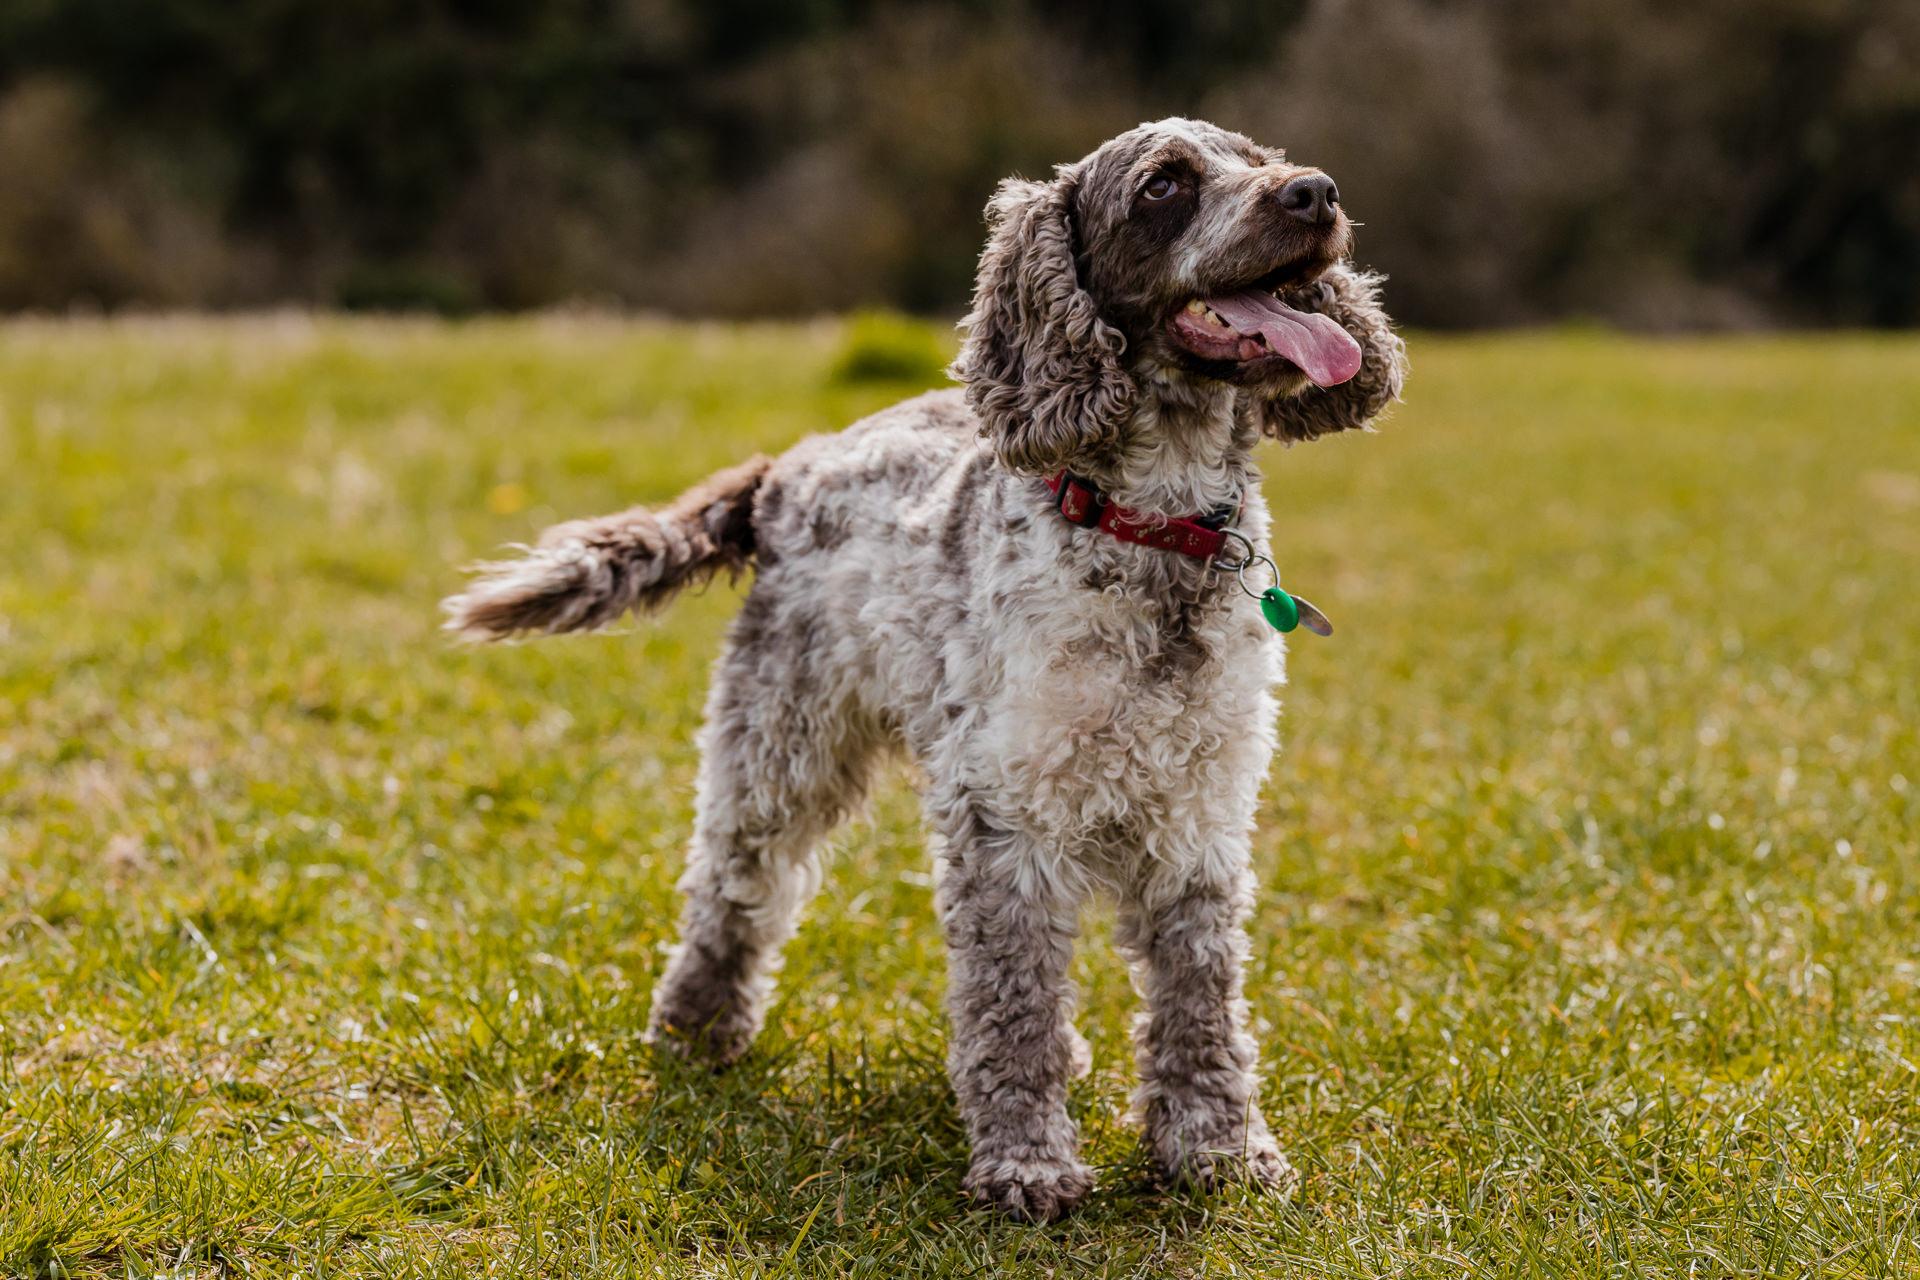 Dog and Pet Photographer Oxford Oxfordshire Banbury Witney Steeple Aston Abingdon Bicester Thame